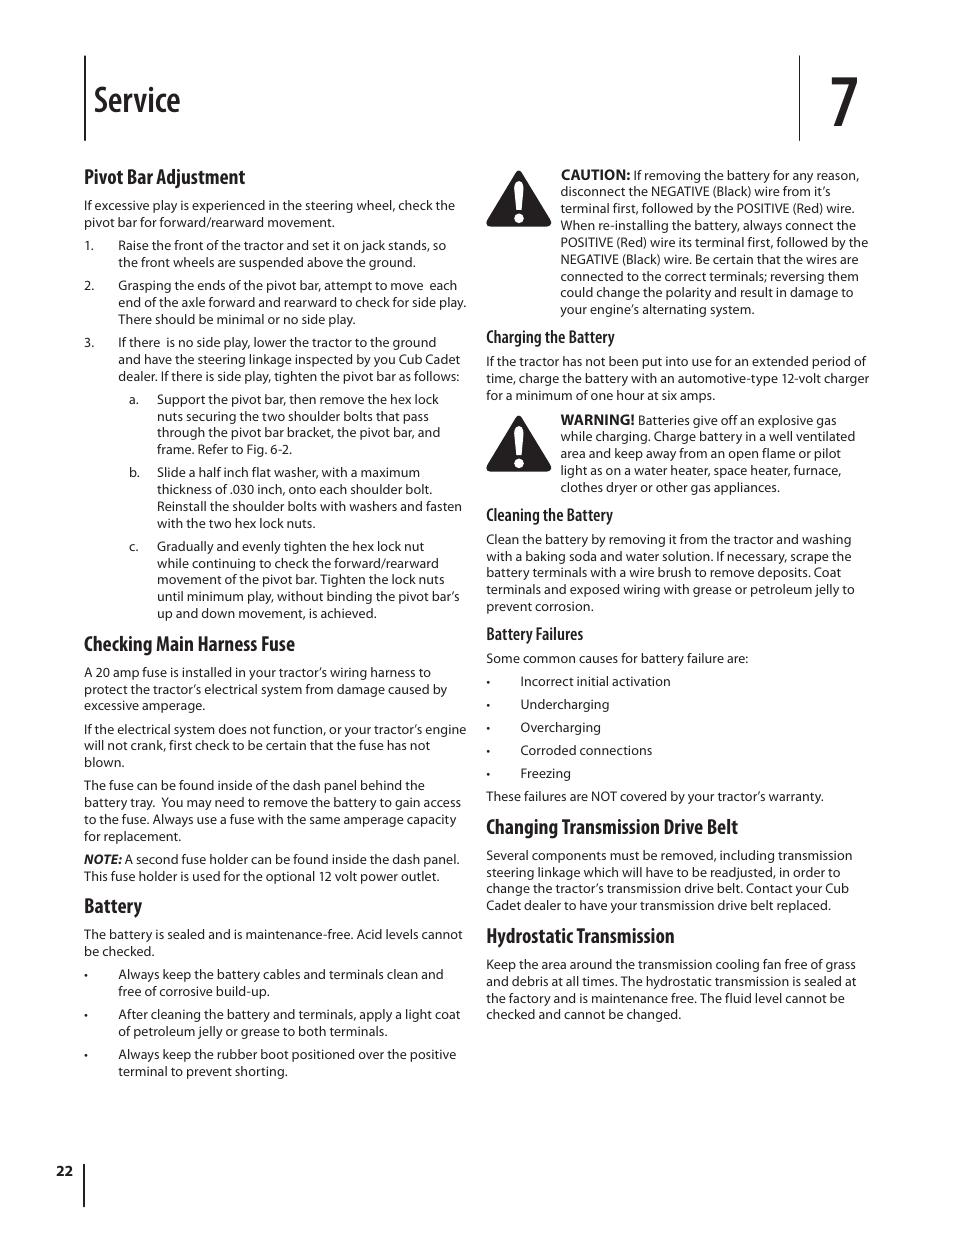 Service, Pivot bar adjustment, Checking main harness fuse | Battery,  Changing transmission drive